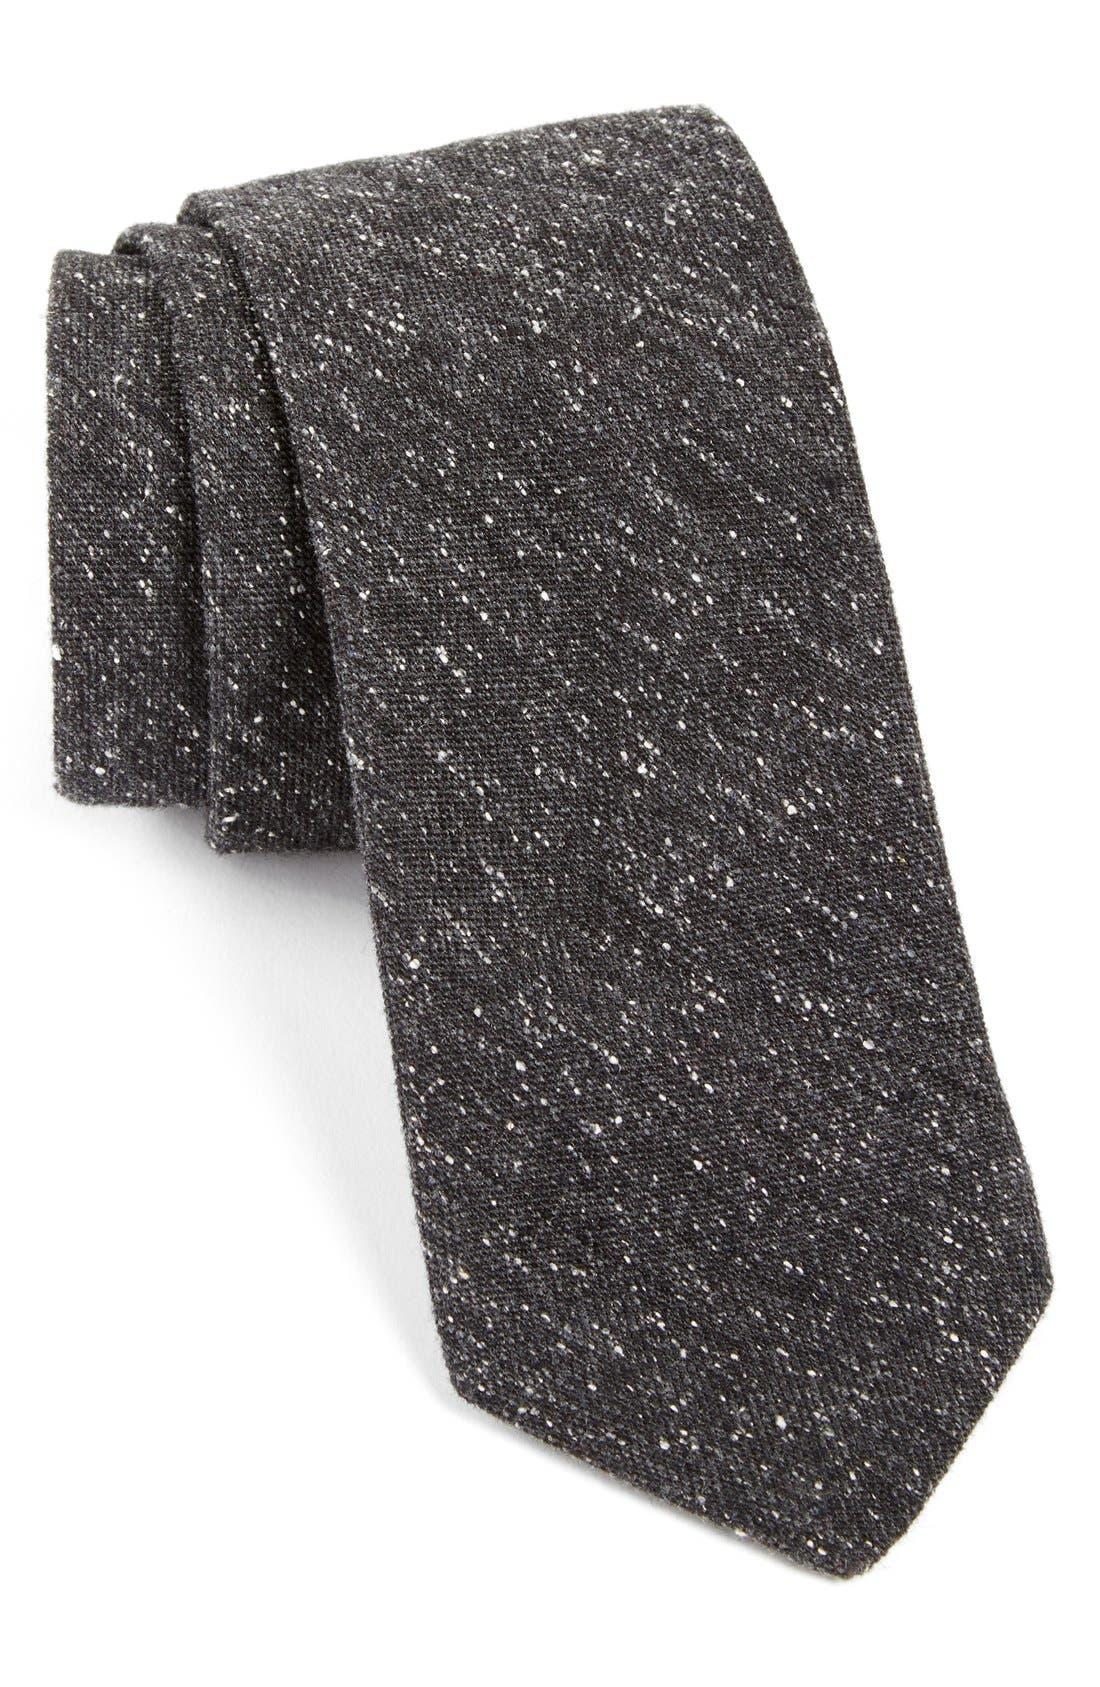 TODD SNYDER WHITE LABEL Solid Cotton Tie, Main, color, 001